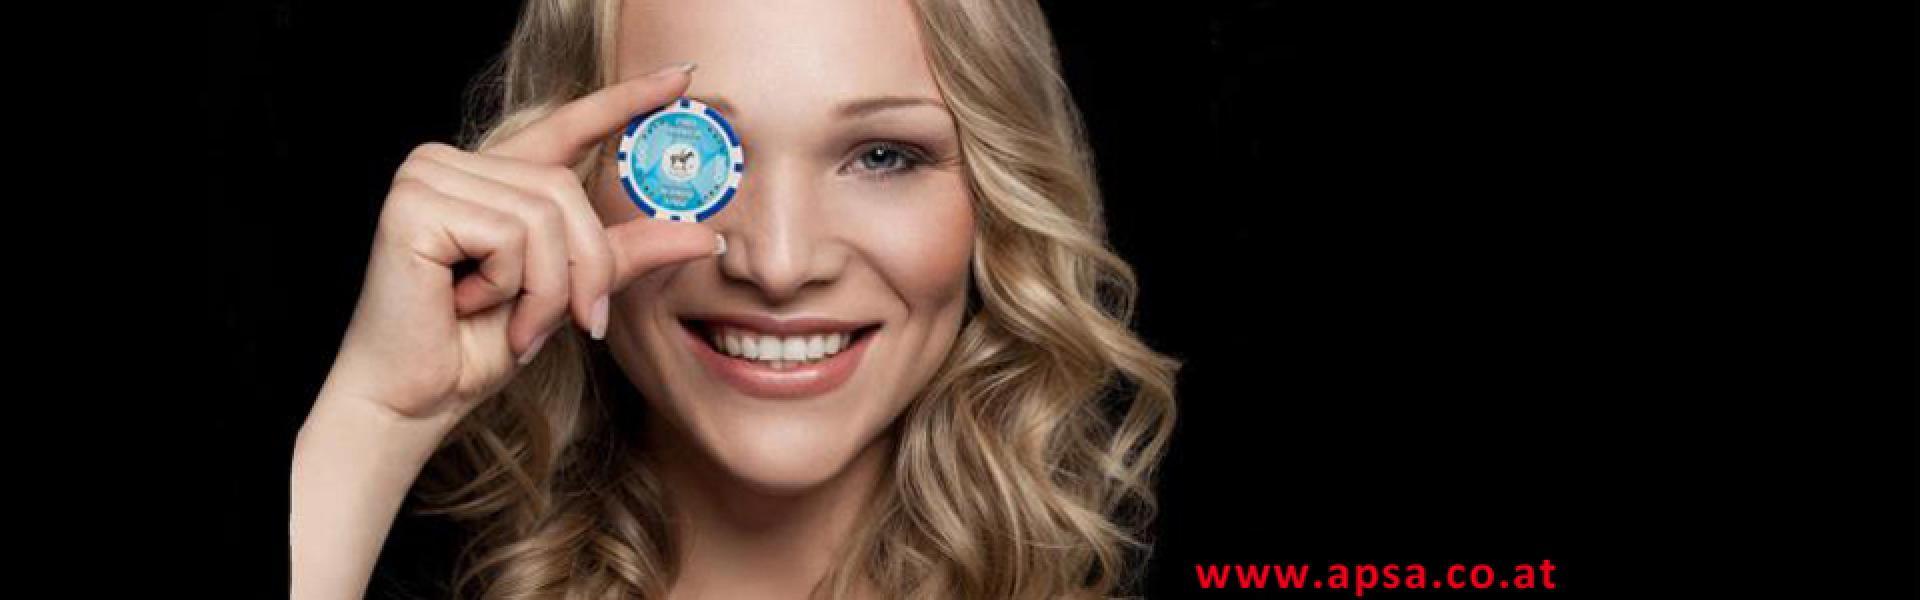 Austrian Pokersport Association cover